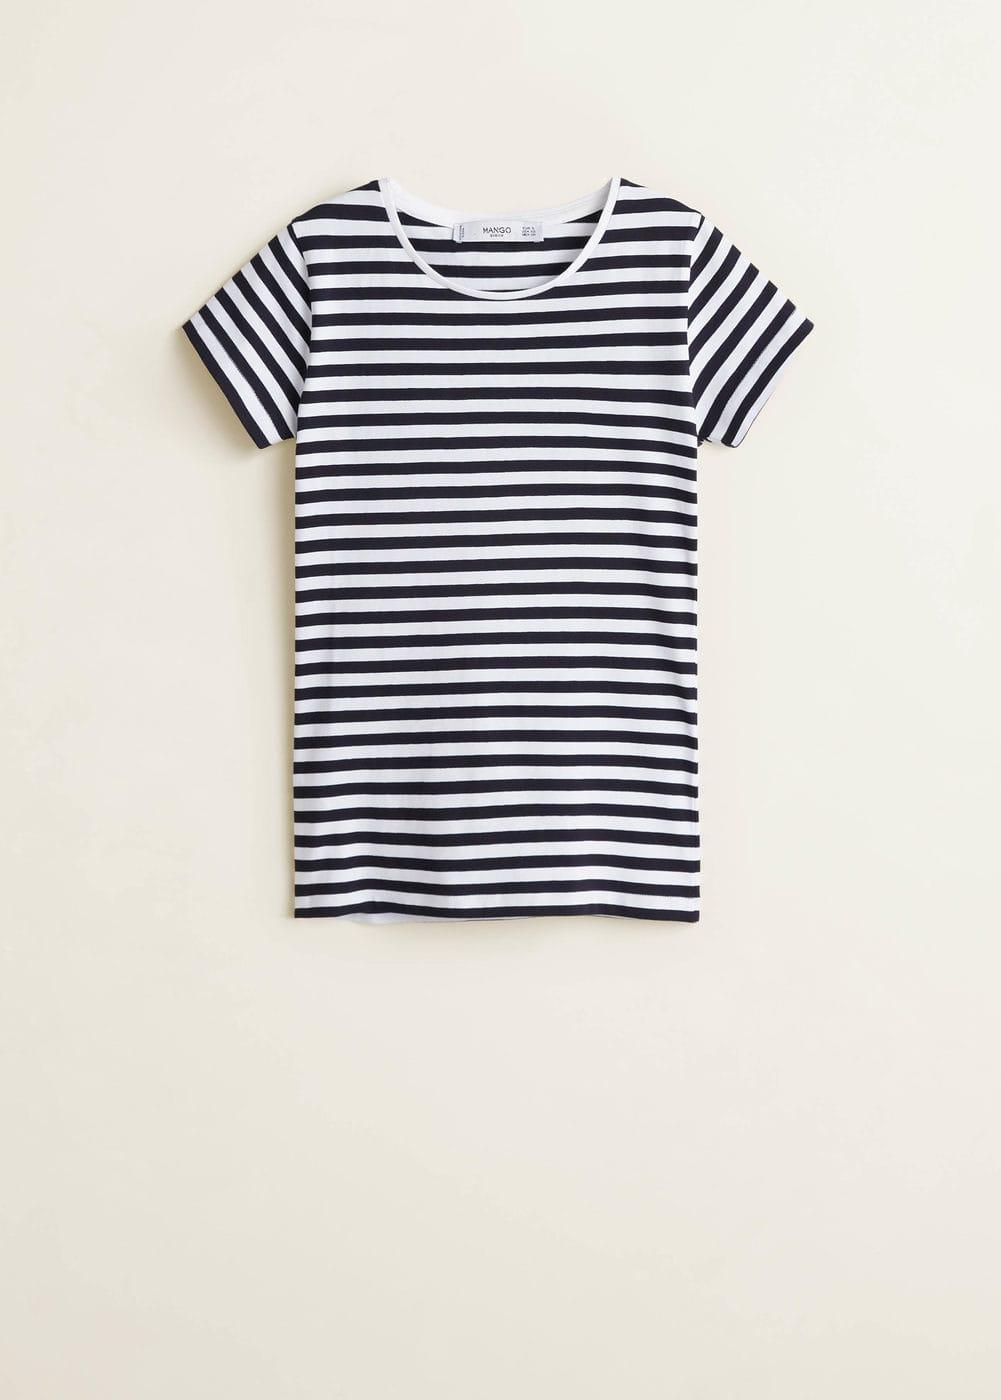 Camiseta MujerMango España Camiseta Básica Básica Algodón MVzSqULGp